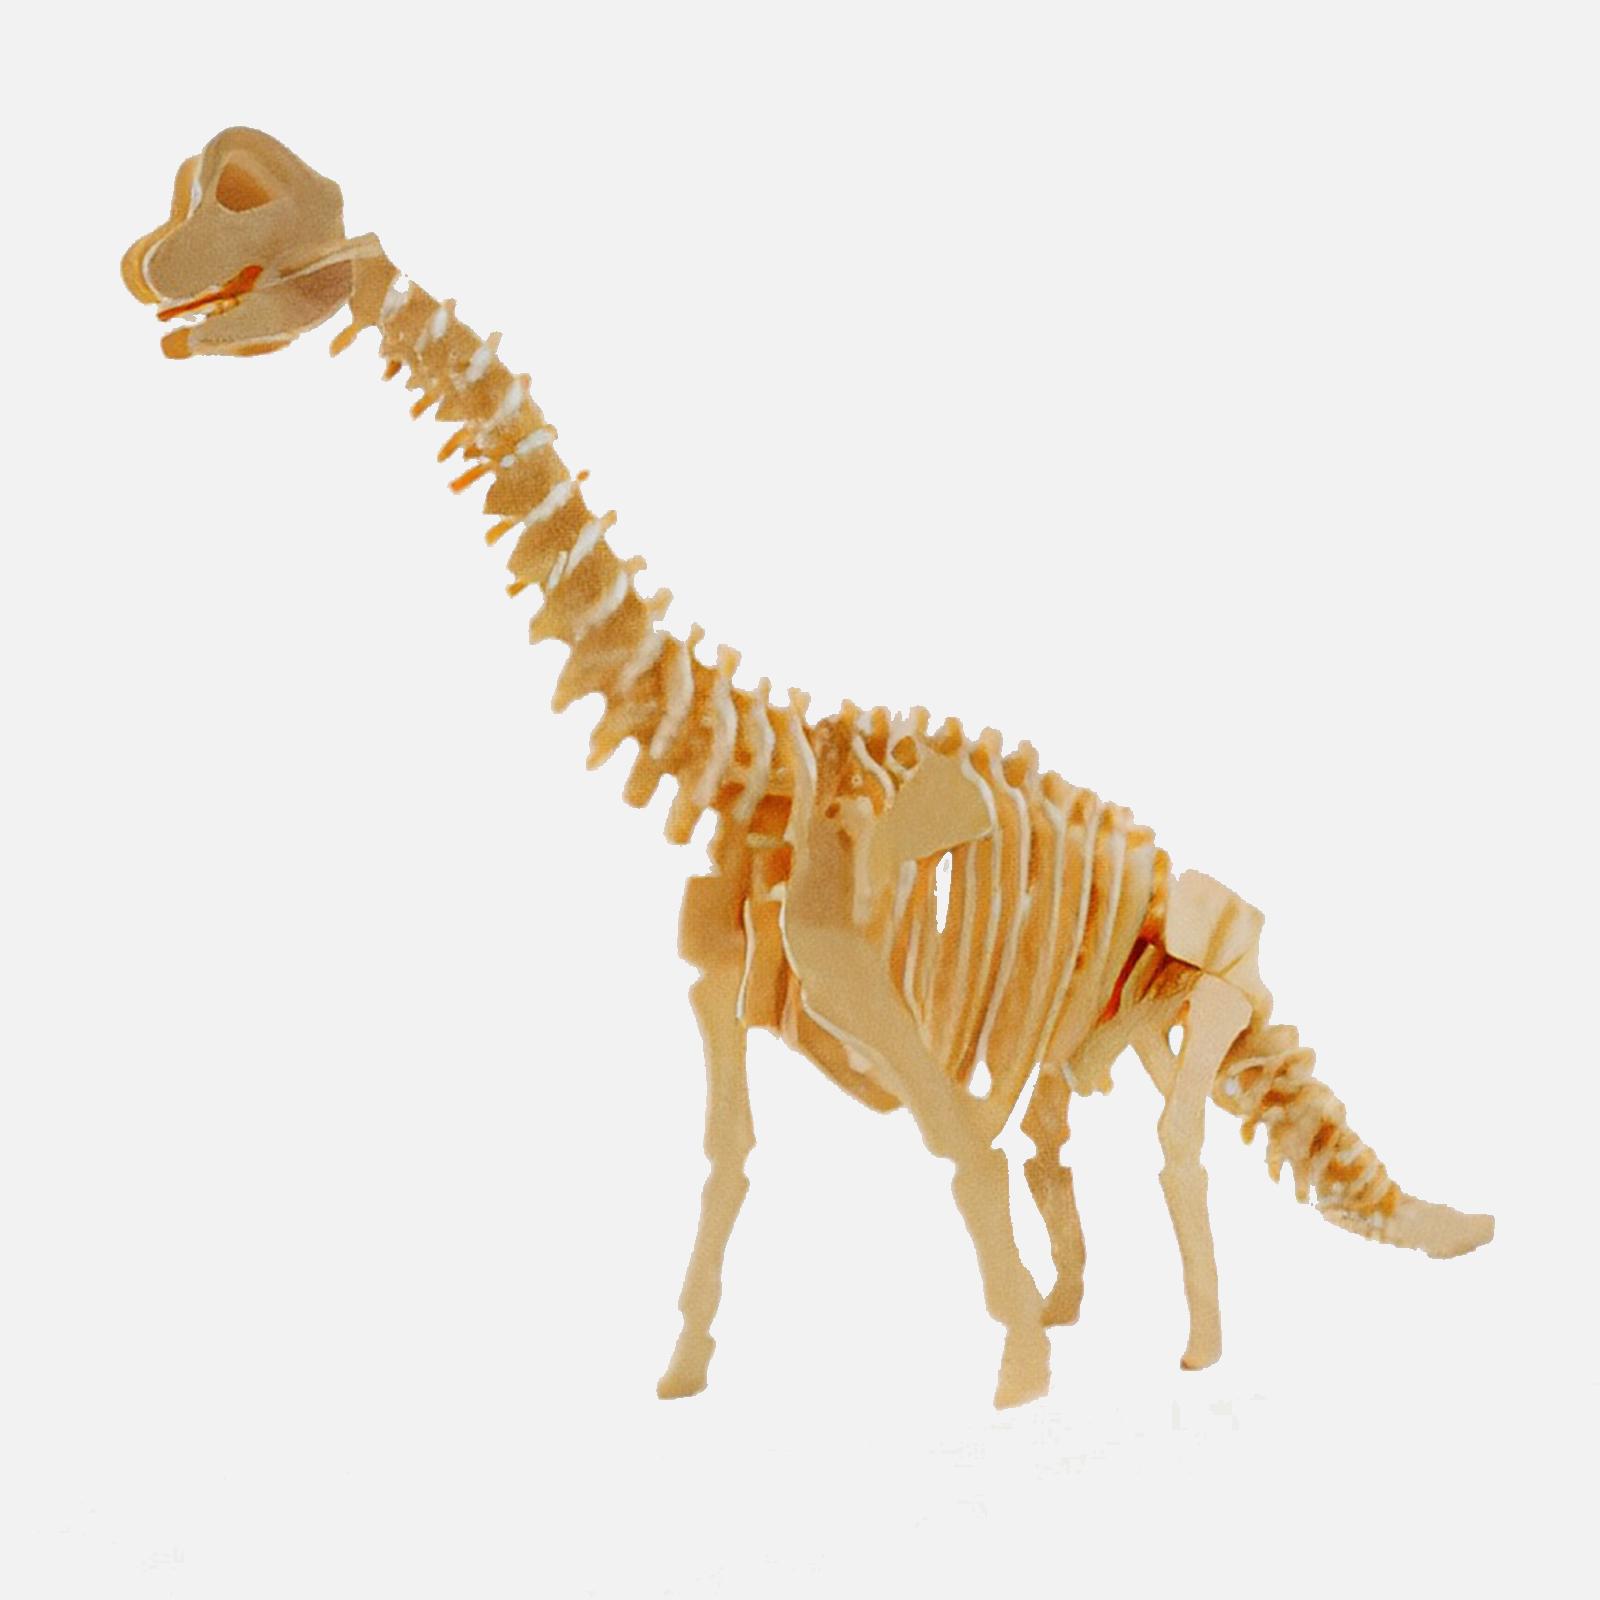 Brachiosaurus 3D Puzzle